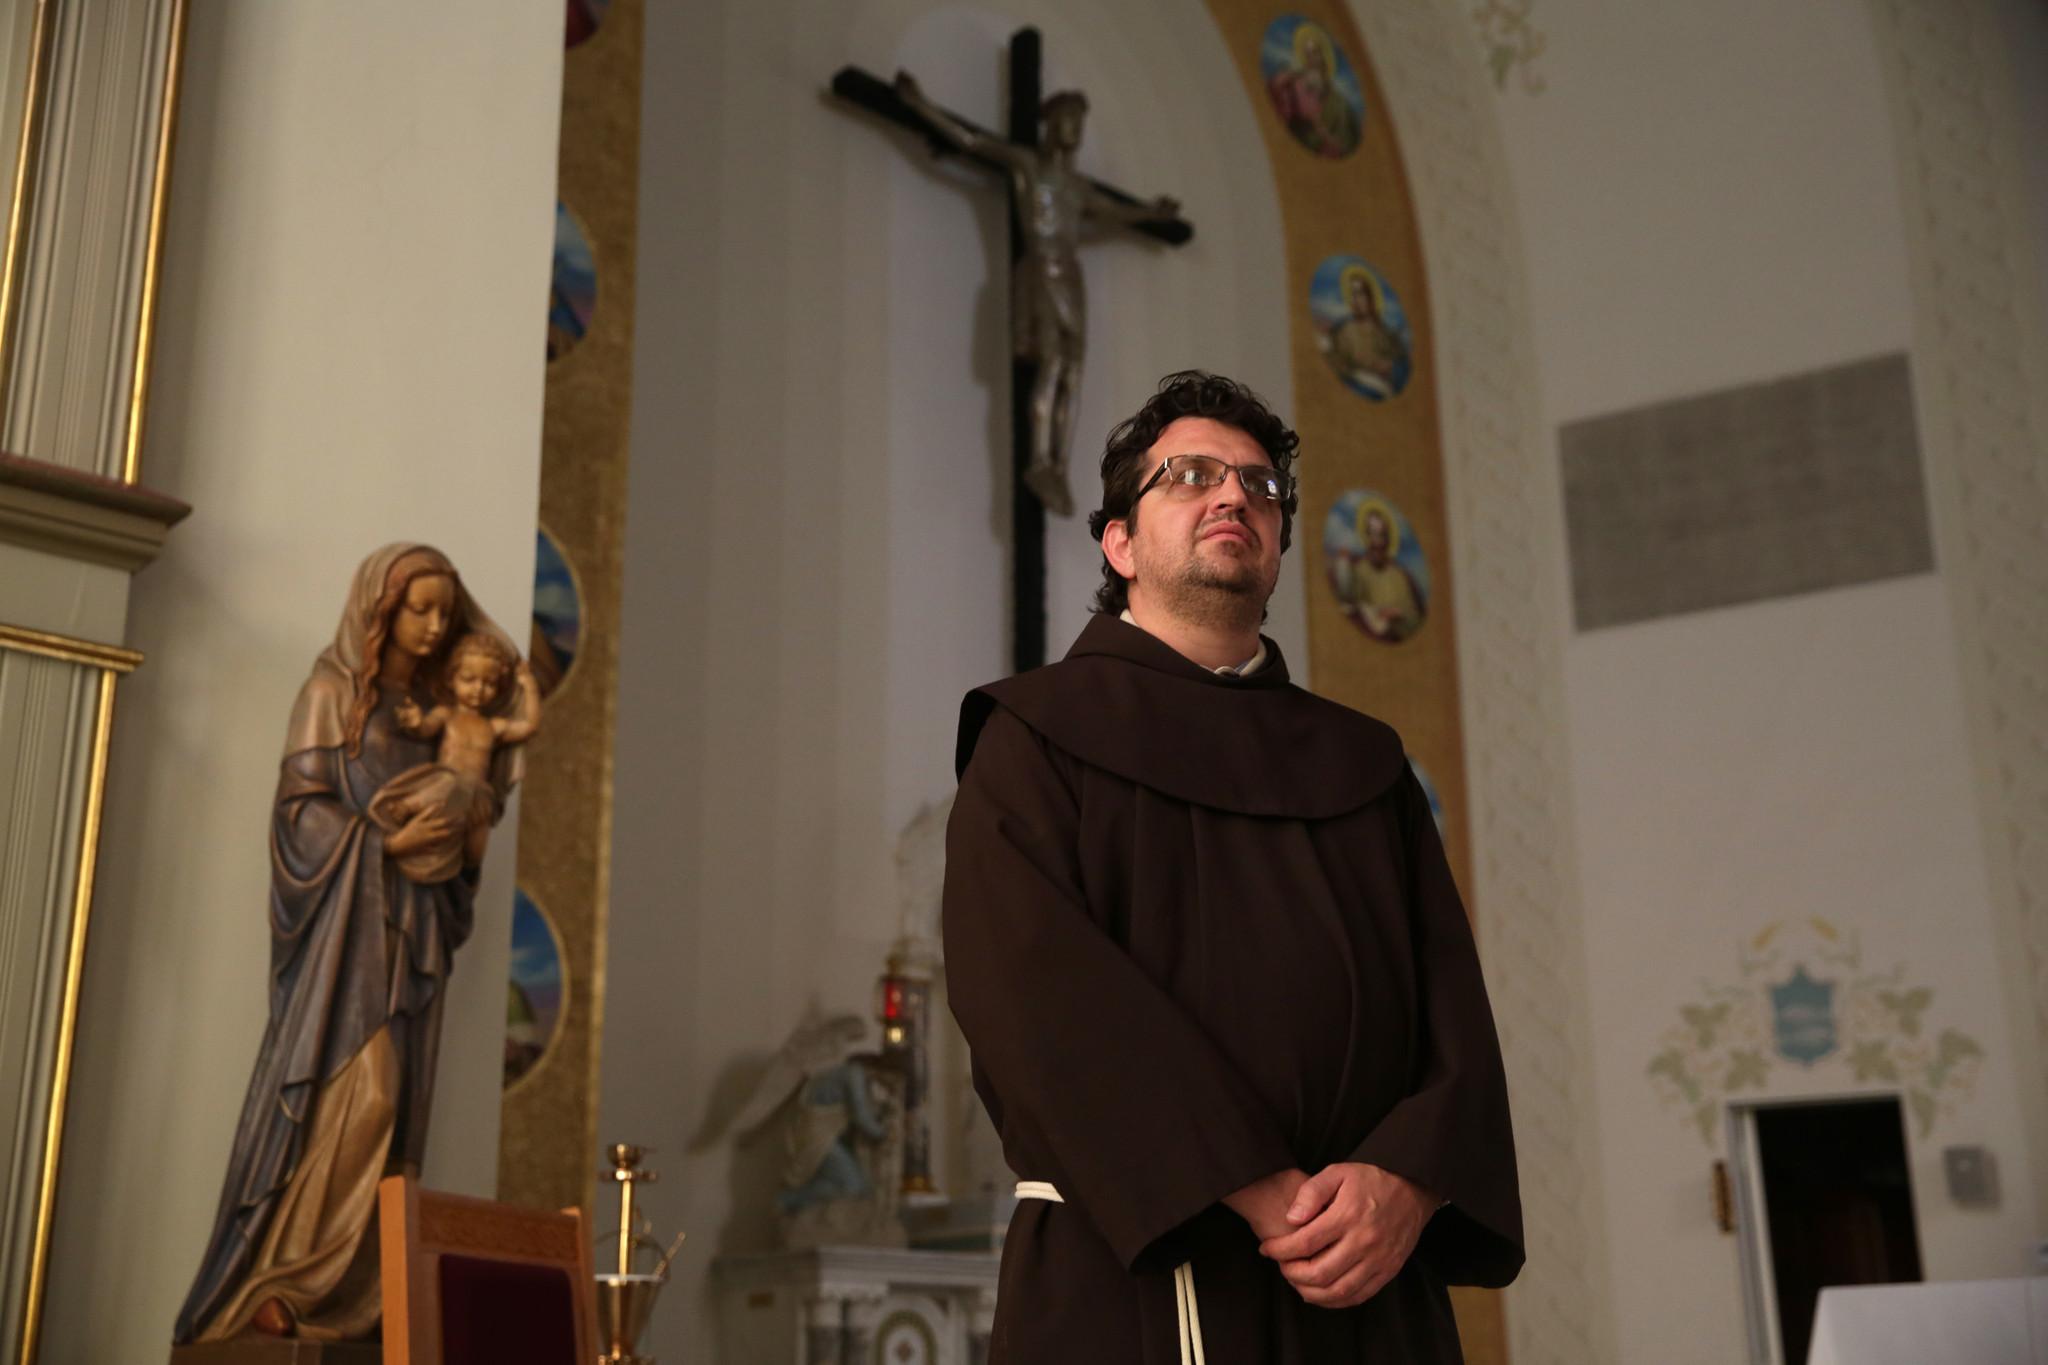 Common heritage bonds next archbishop, Chicago's Croatian Catholics